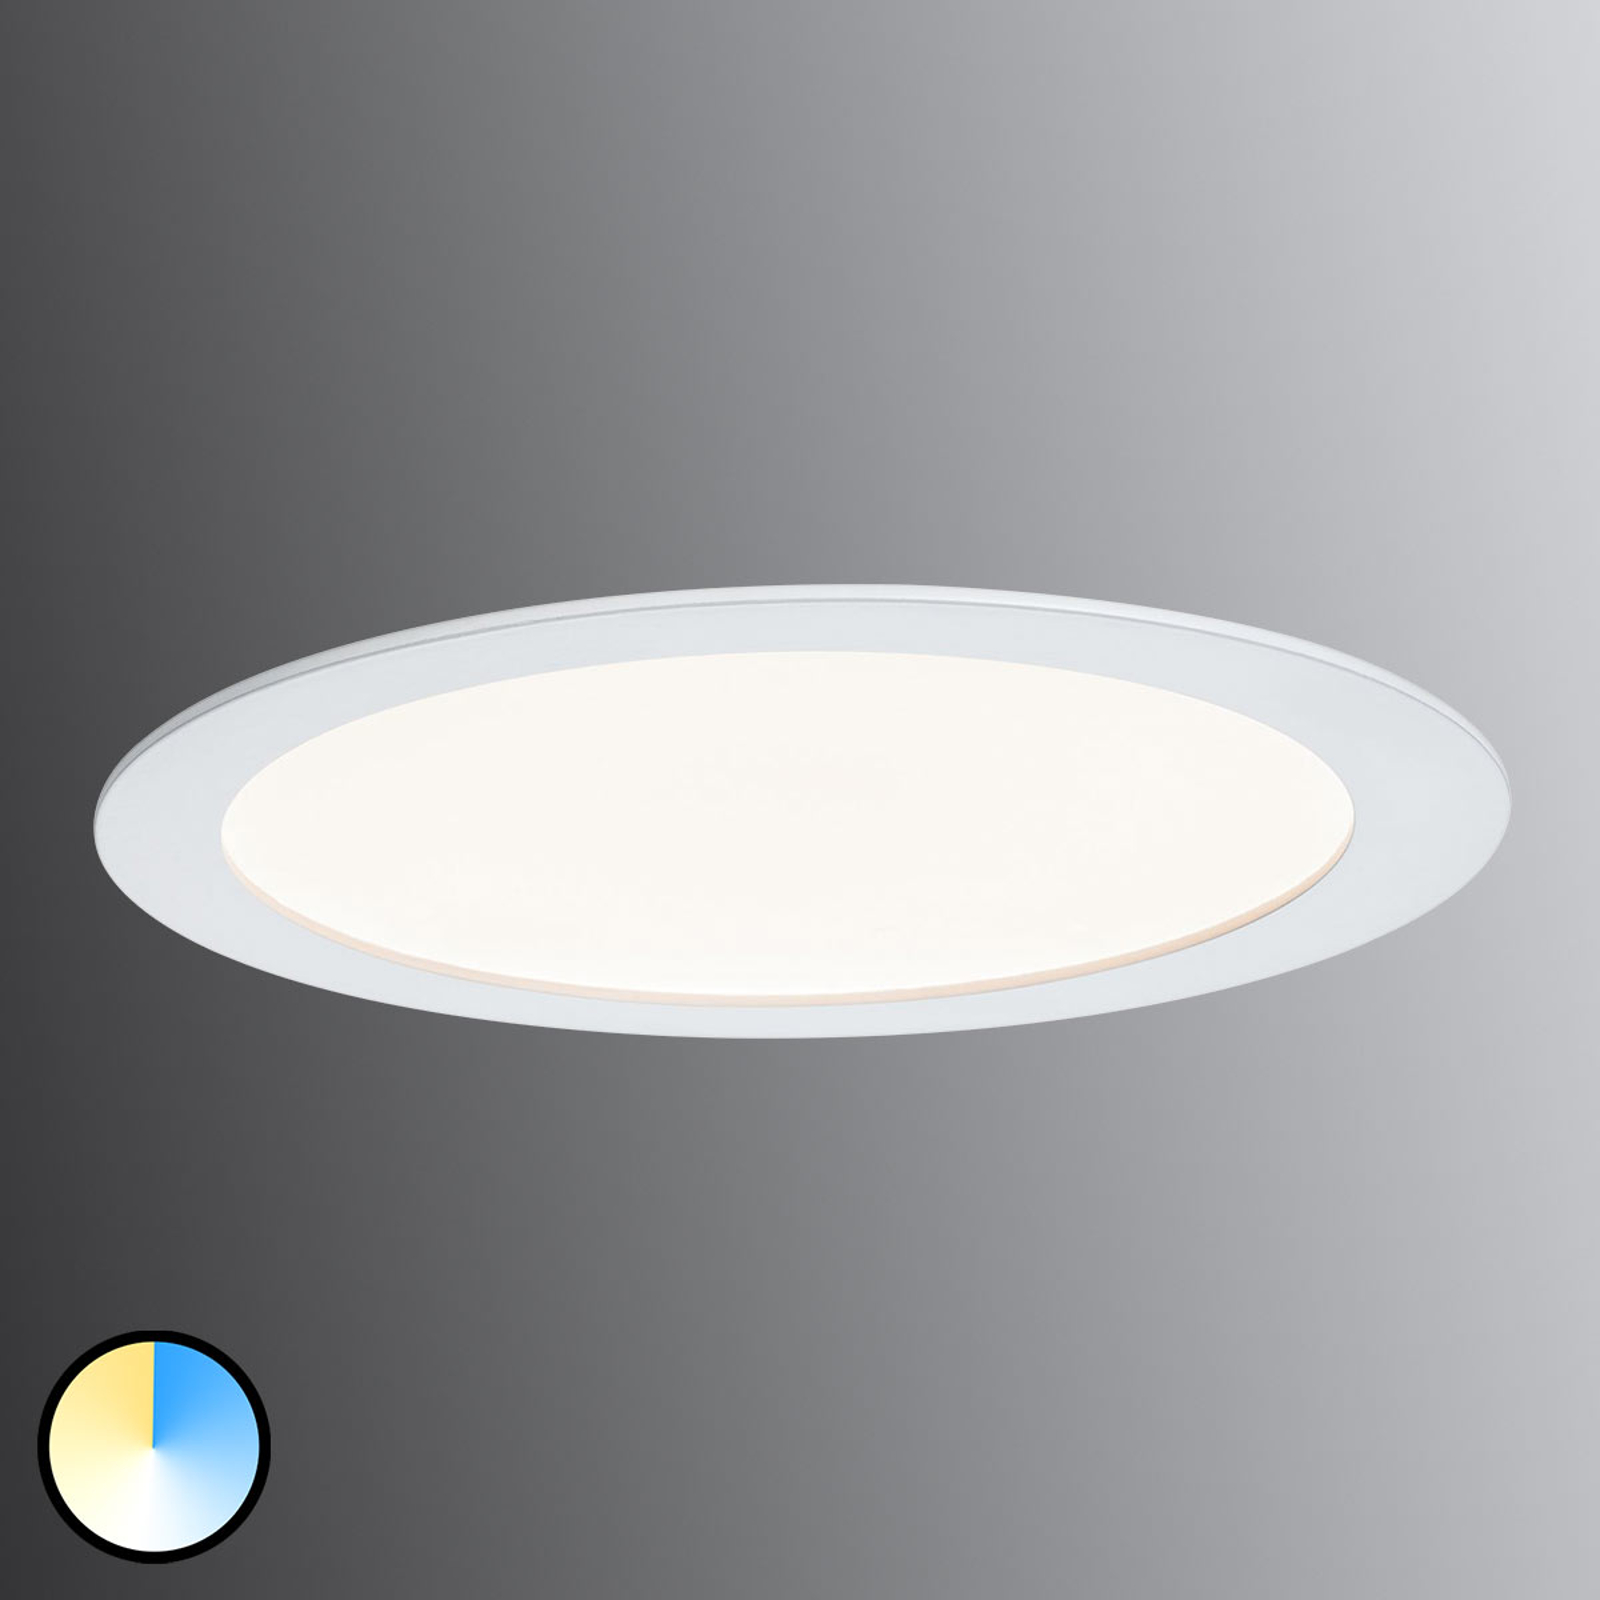 Paulmann Smart Friends Spot LED incasso More Ø17cm Illuminazione per interni